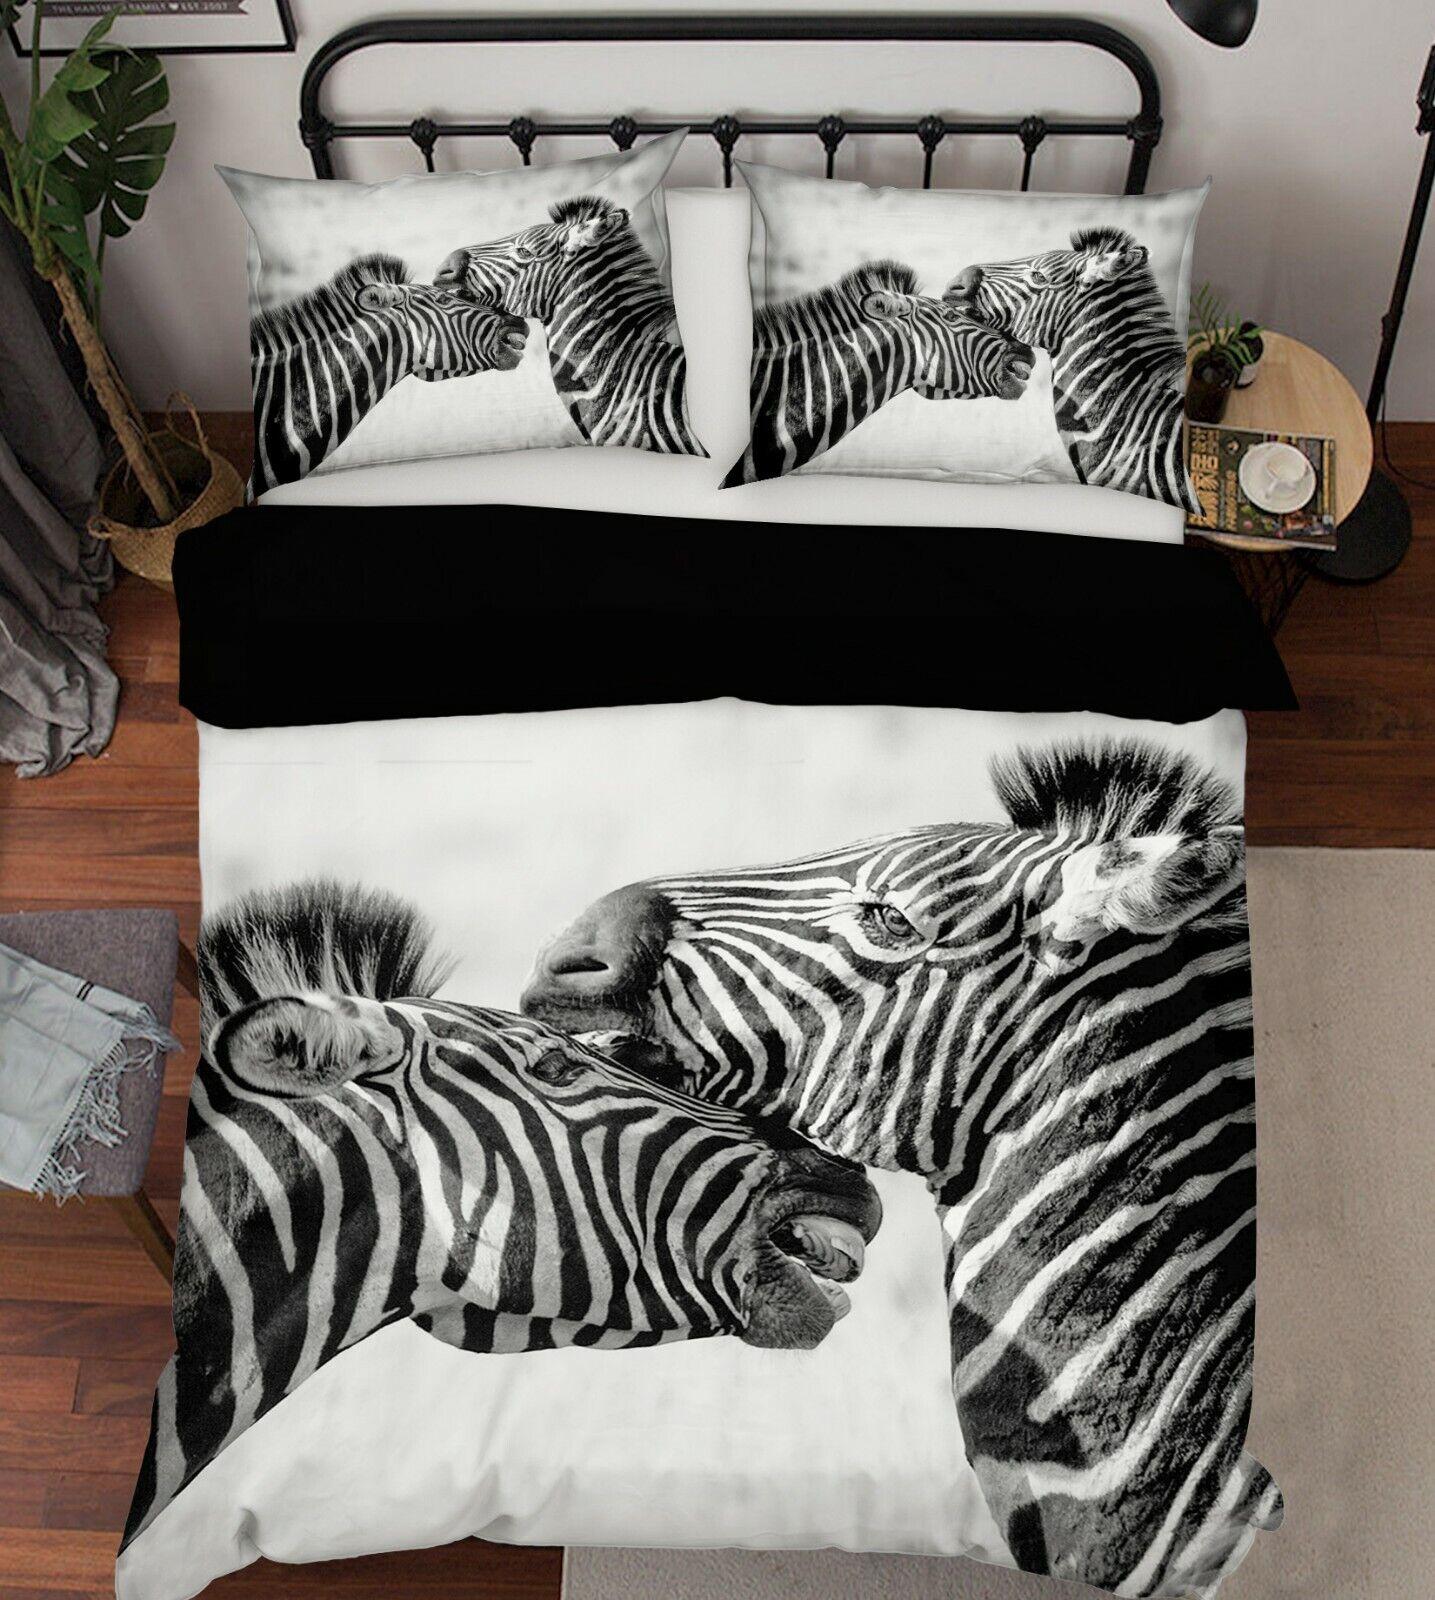 3D Zebra Grassland P23 Animal Bed PilFaiblecases Quilt Duvet Cover Set Queen Zoe